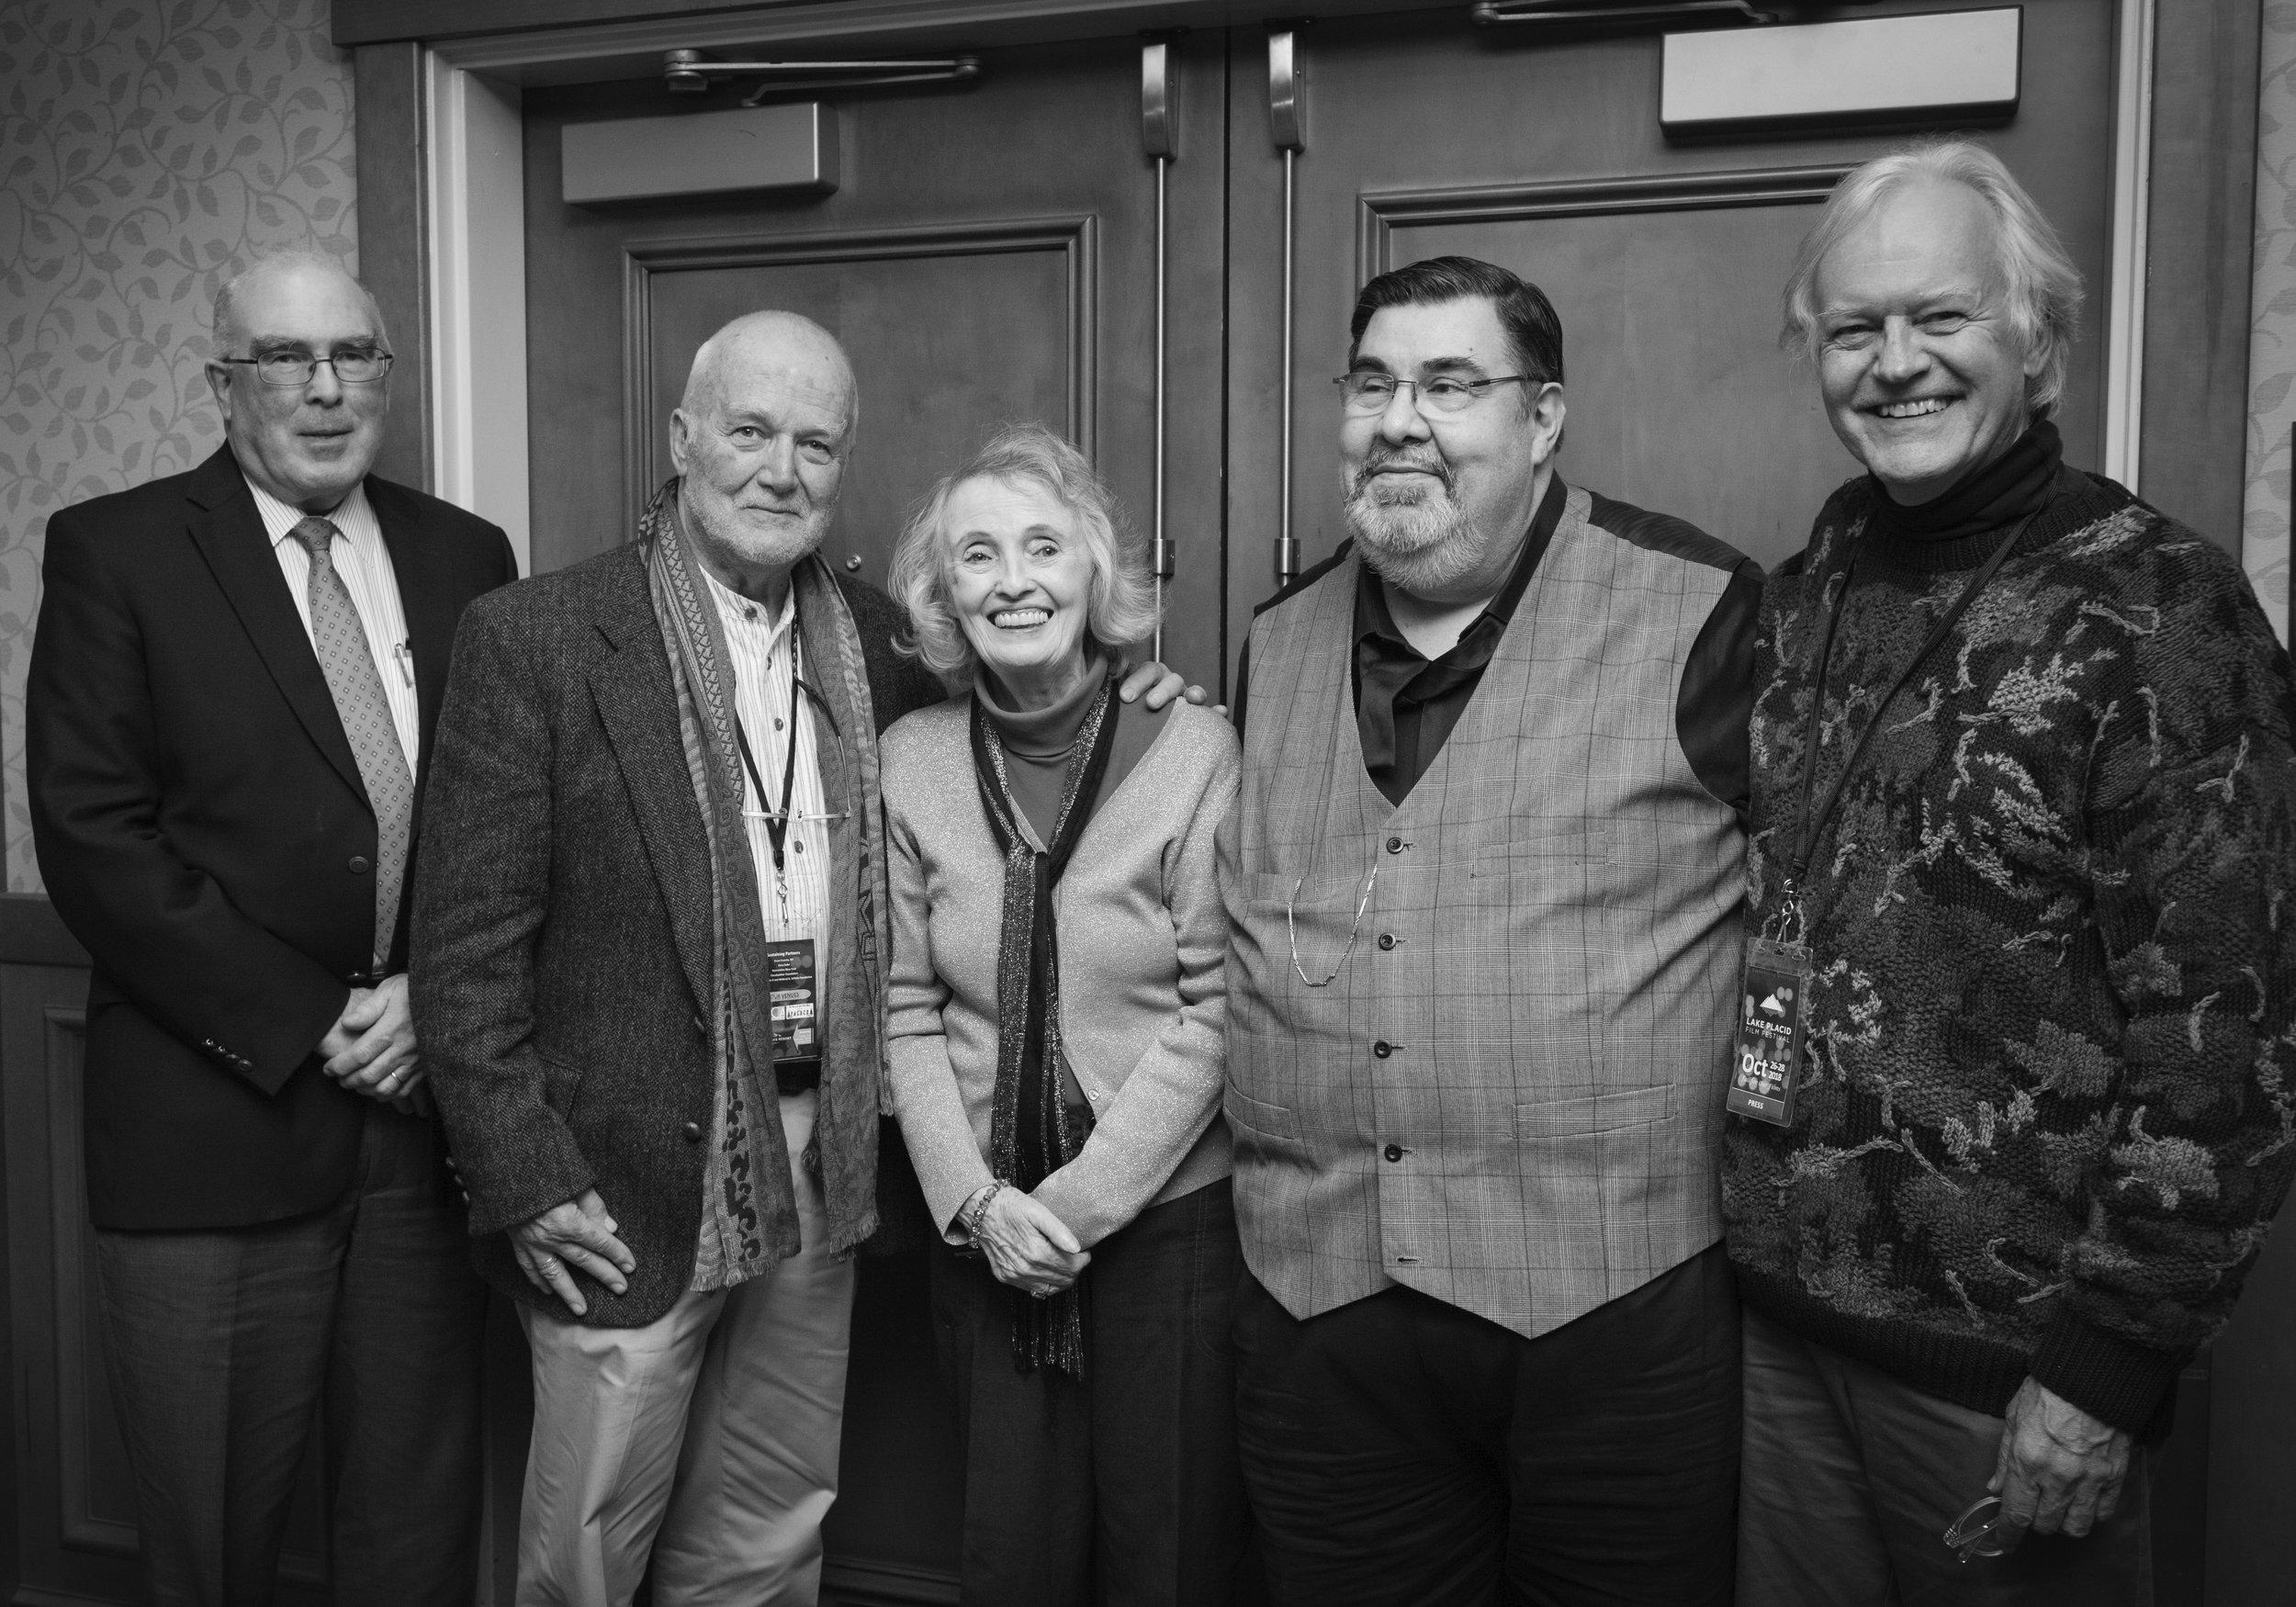 Adirondack Film Society Founders, John Huttlinger, Russell Banks, Kathleen Carroll, Nelson Page, Naj Wykoff LPFF 2018